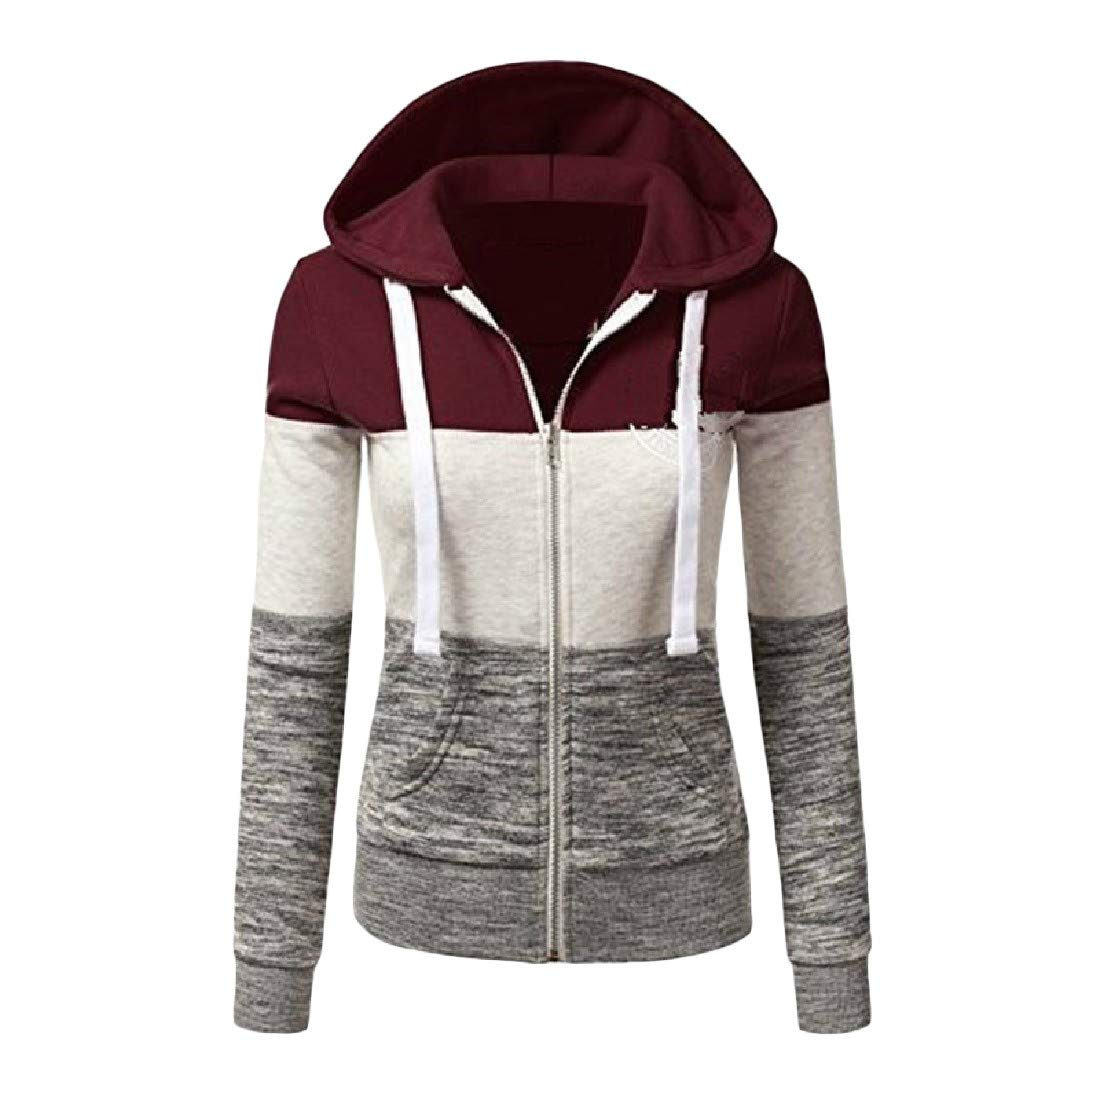 YUNY Women Hood Stylish Baseball Fall Jacket Sweatshirt 1 XS